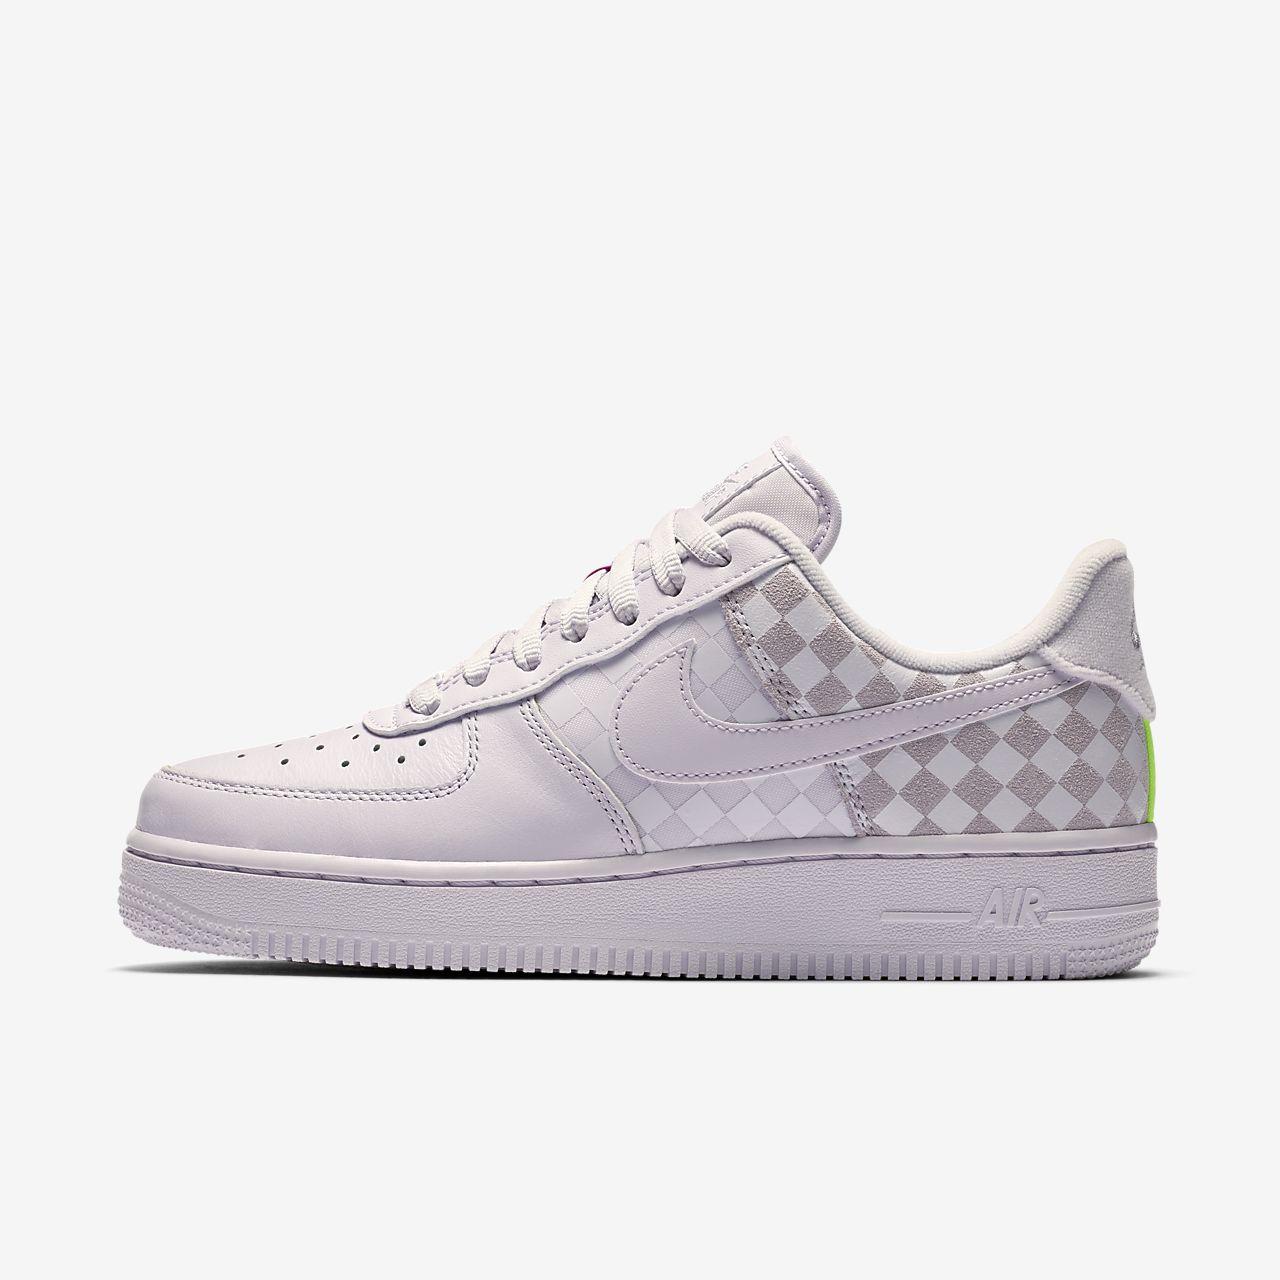 Nike Air Force 1 Low Damesschoen met ruitpatroon